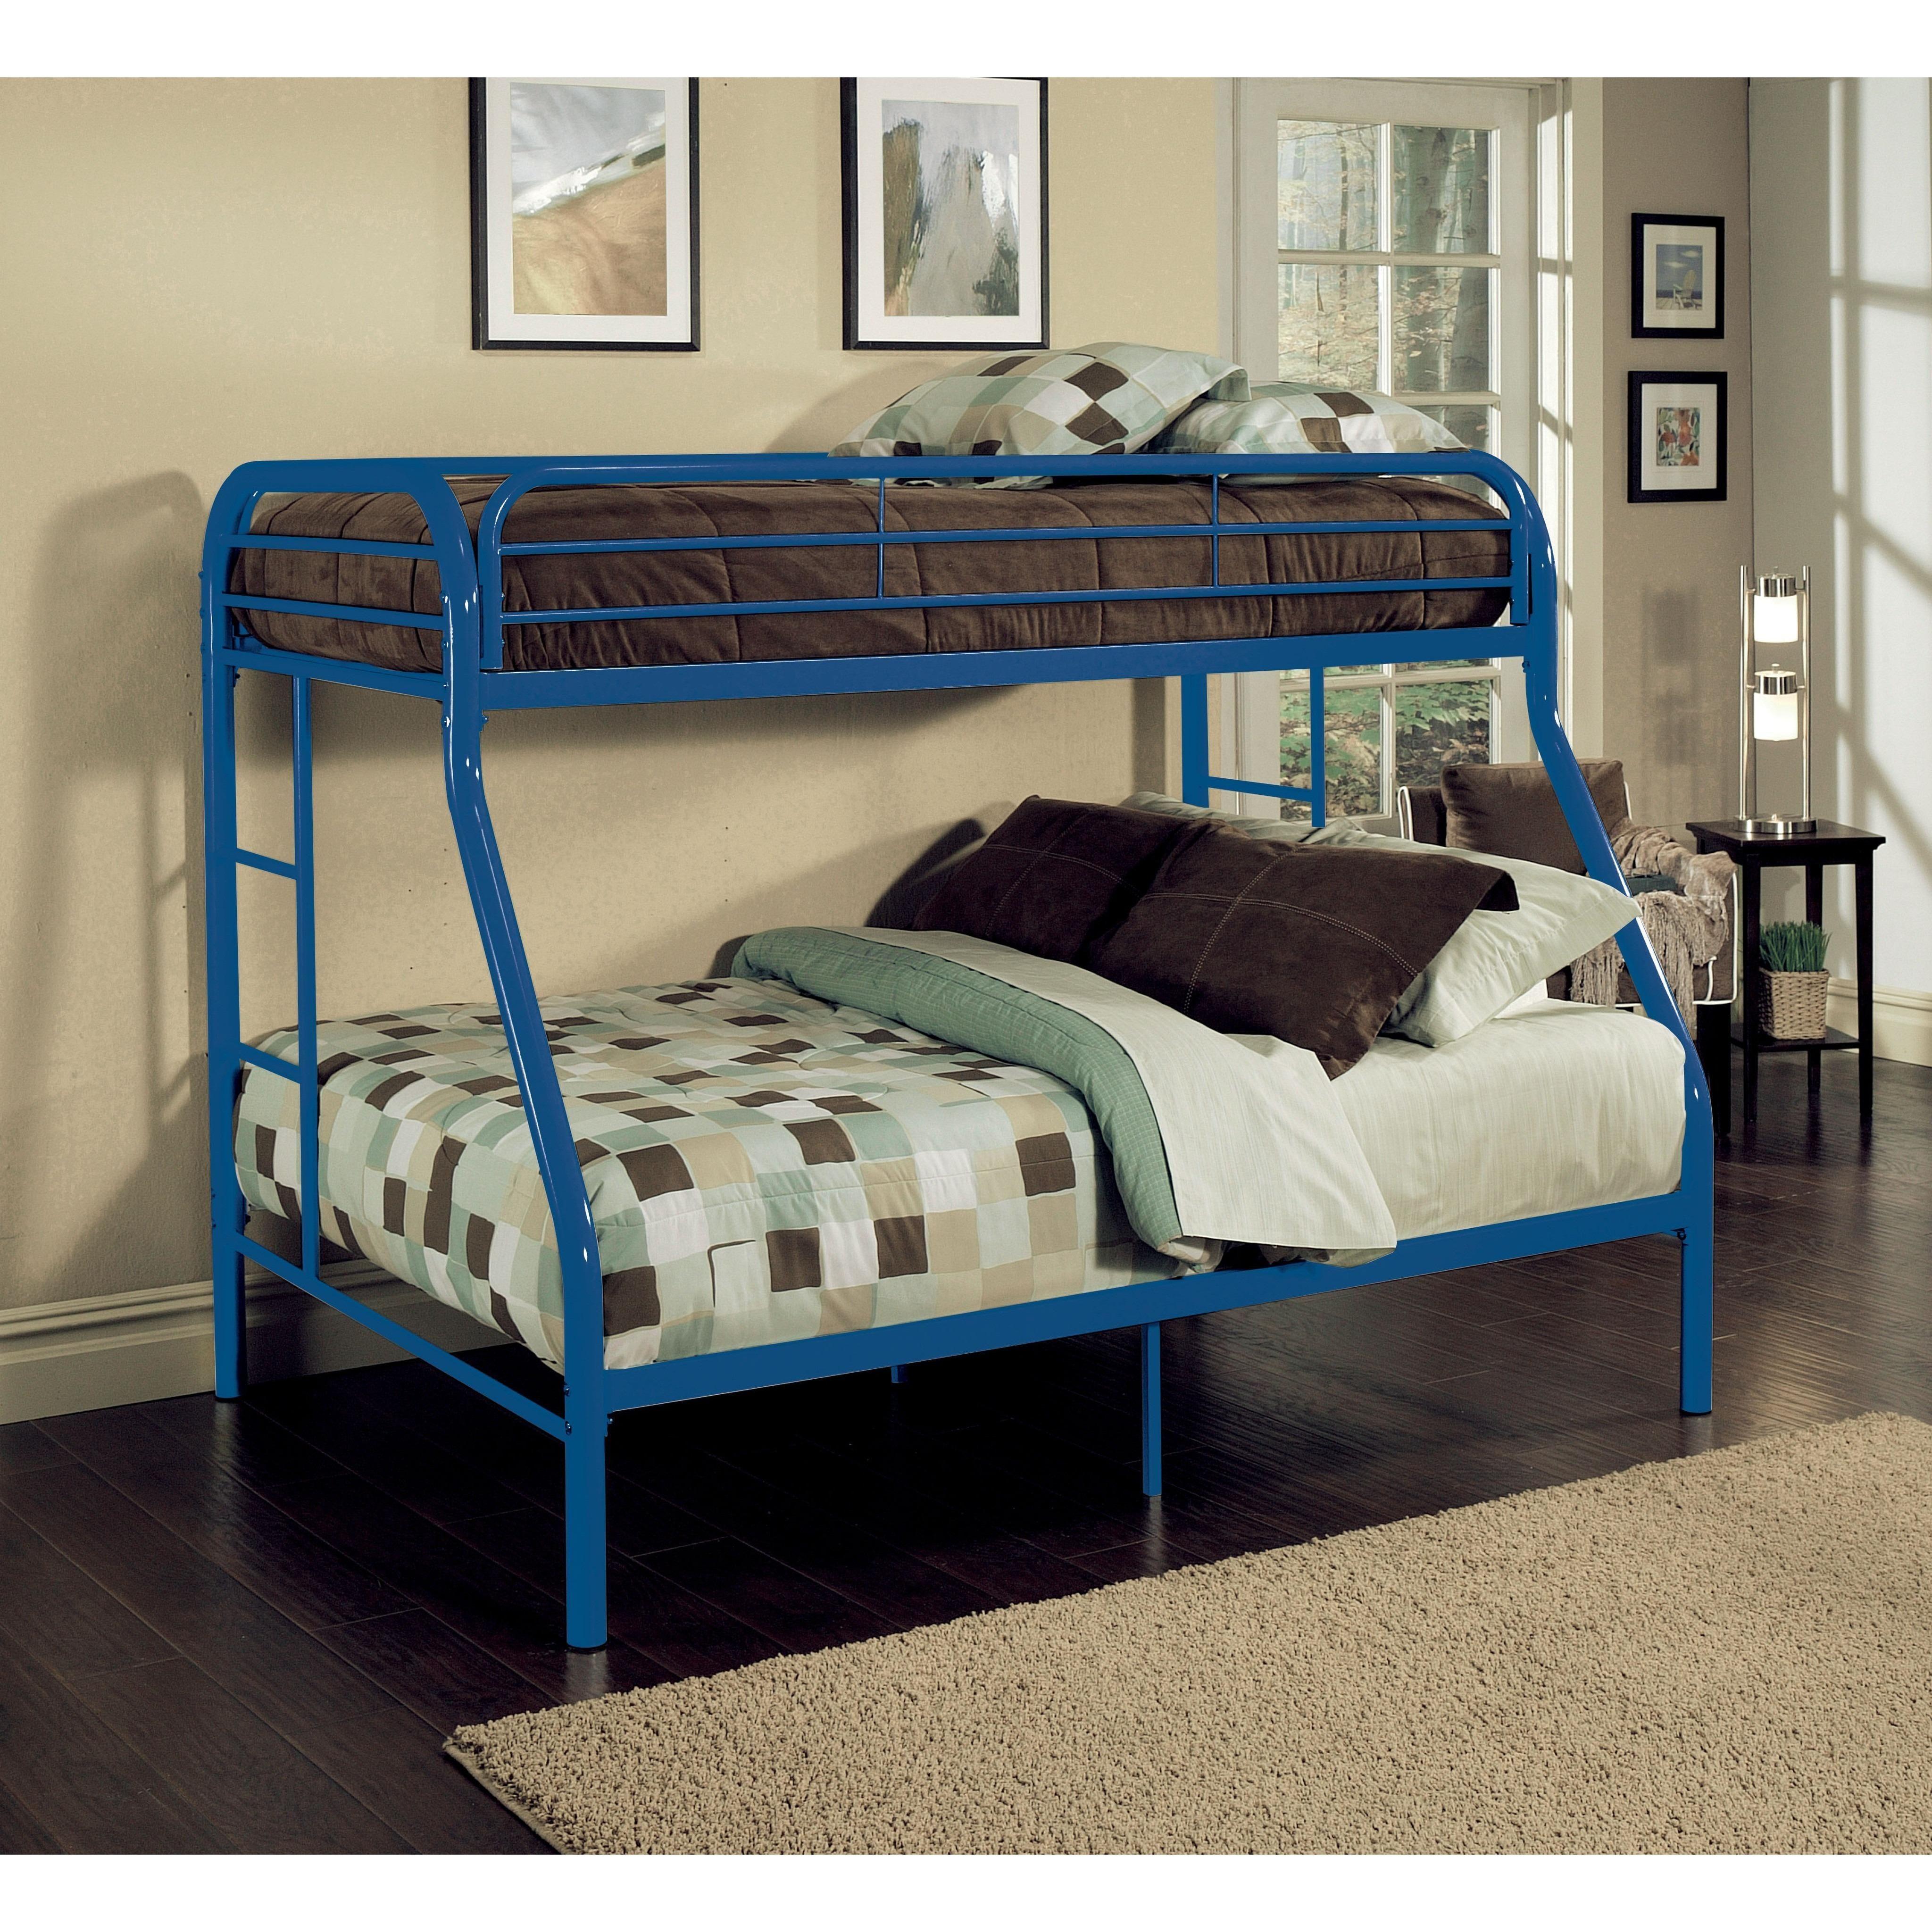 Tritan Rainbow Metal Twin over Full Bunk Bed